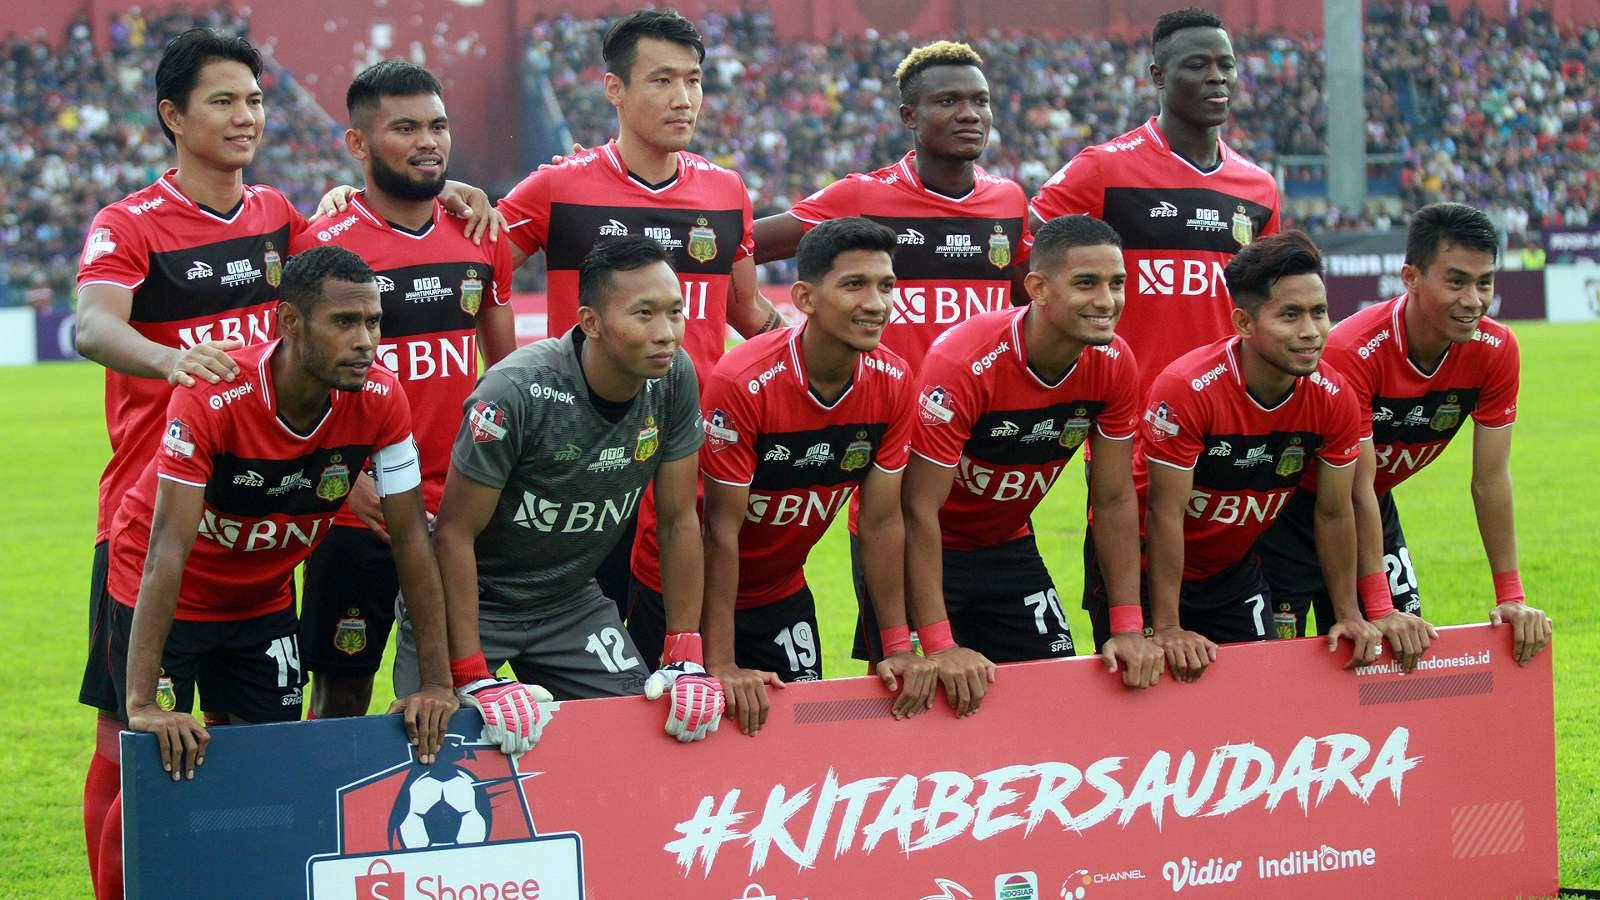 Bhayangkara FC vs Persija Jakarta: Jadwal TV, Live Streaming, Kabar Terkini Skuad, Pr …